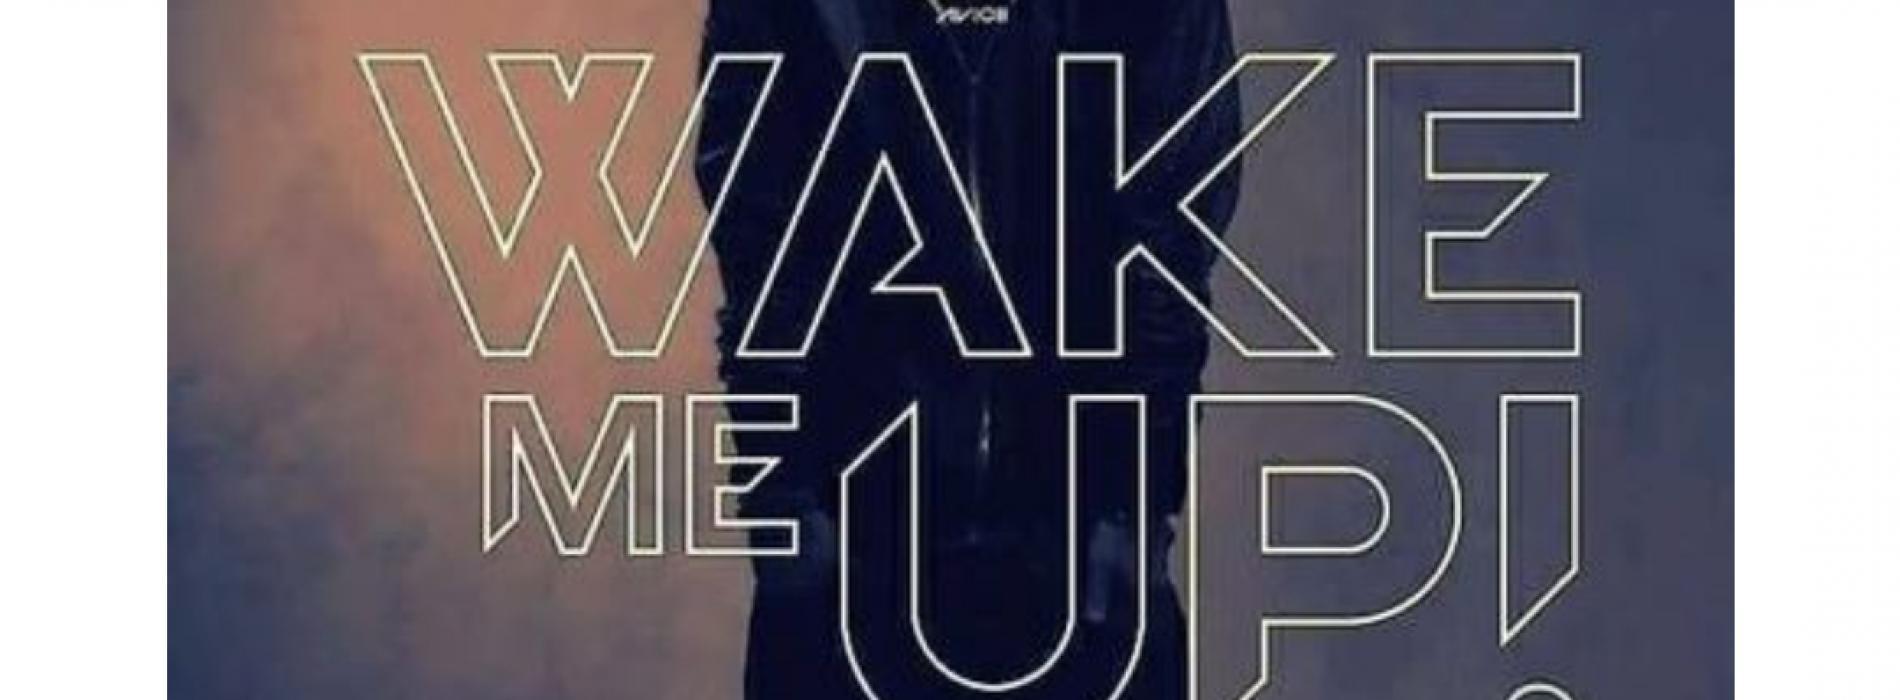 SS BrotherZ – Wake Me Up (remix)